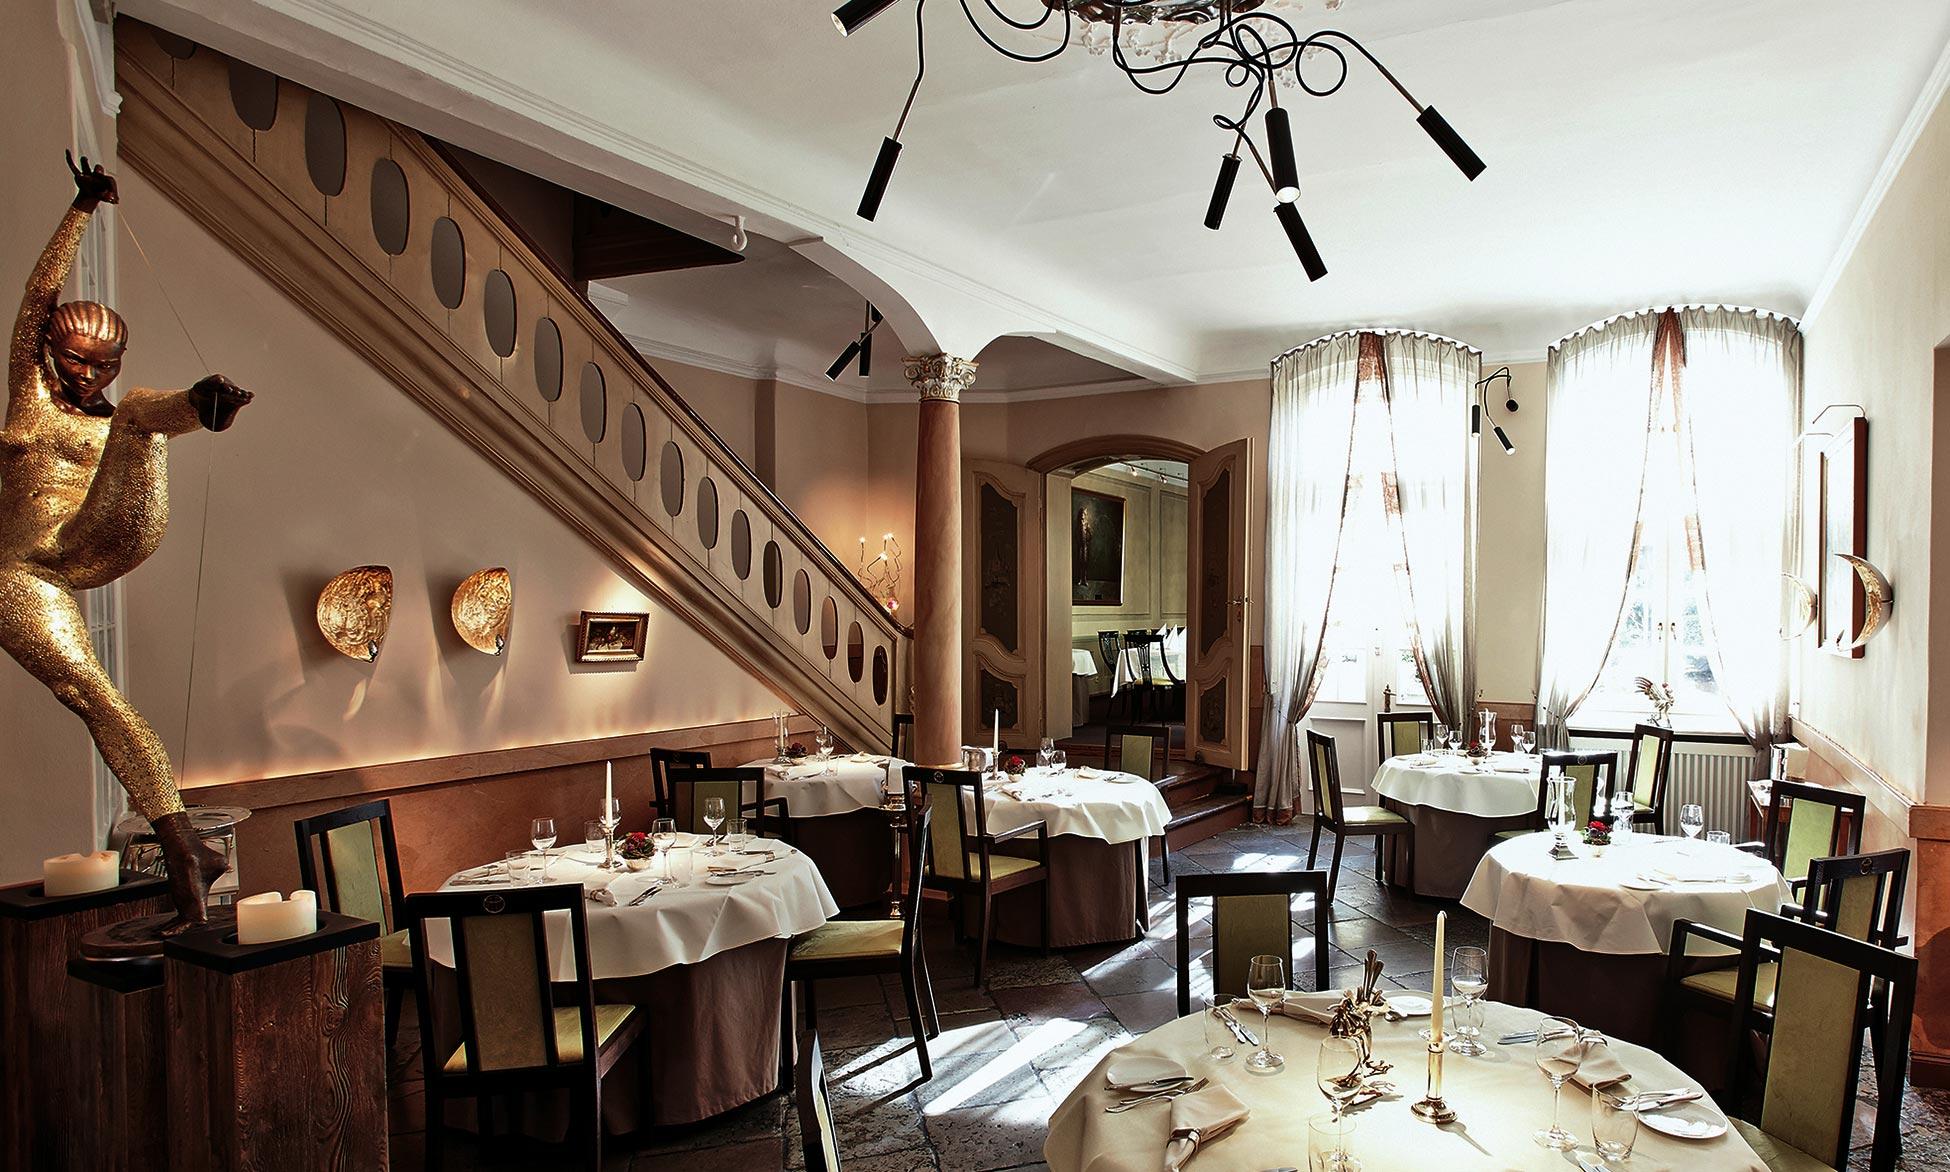 Willkommen bei - Roy Petermann | Restaurant Wullenwever